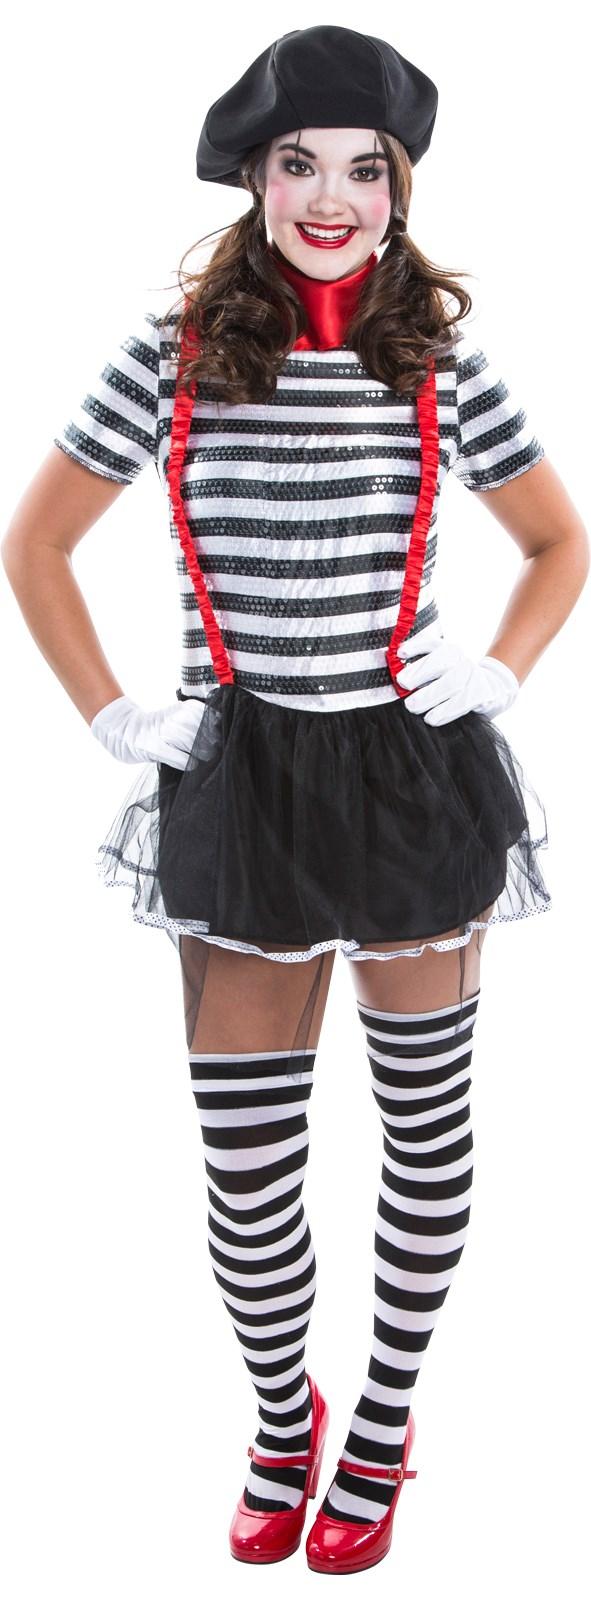 Womens Mime Costume | BuyCostumes.com